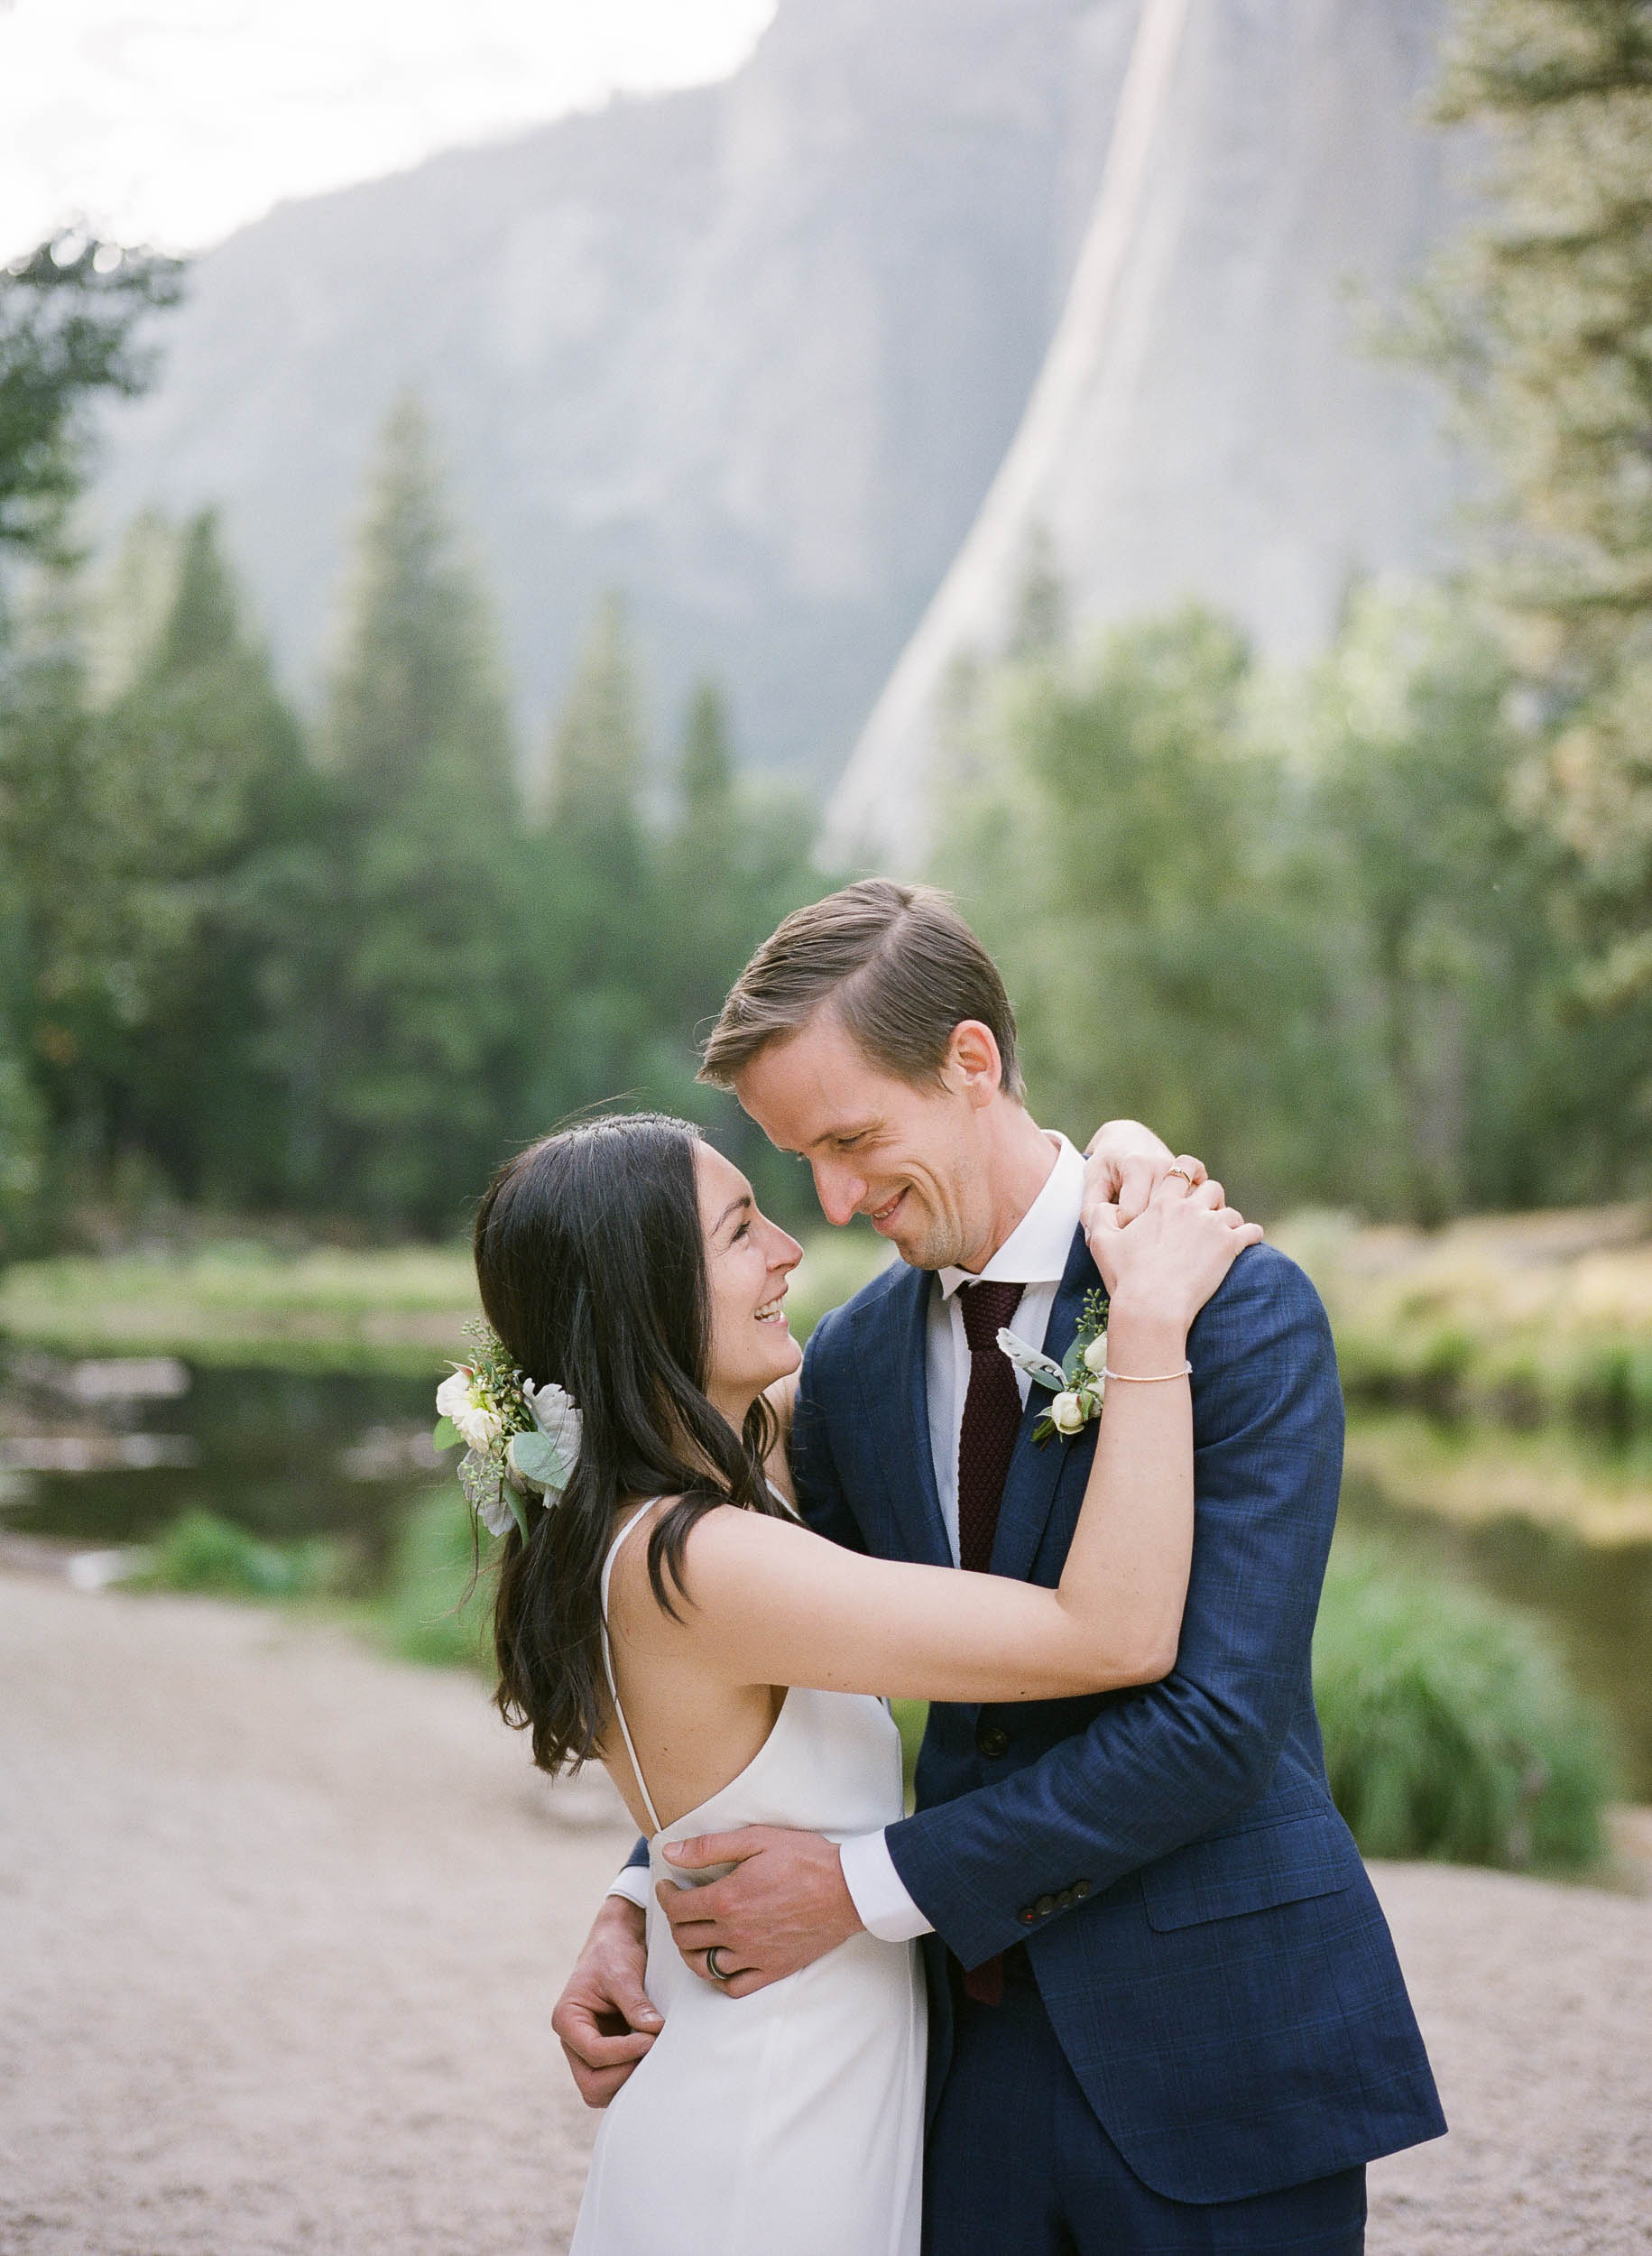 Intimate Yosemite Wedding_Buena Lane Photography_000063830010.jpg